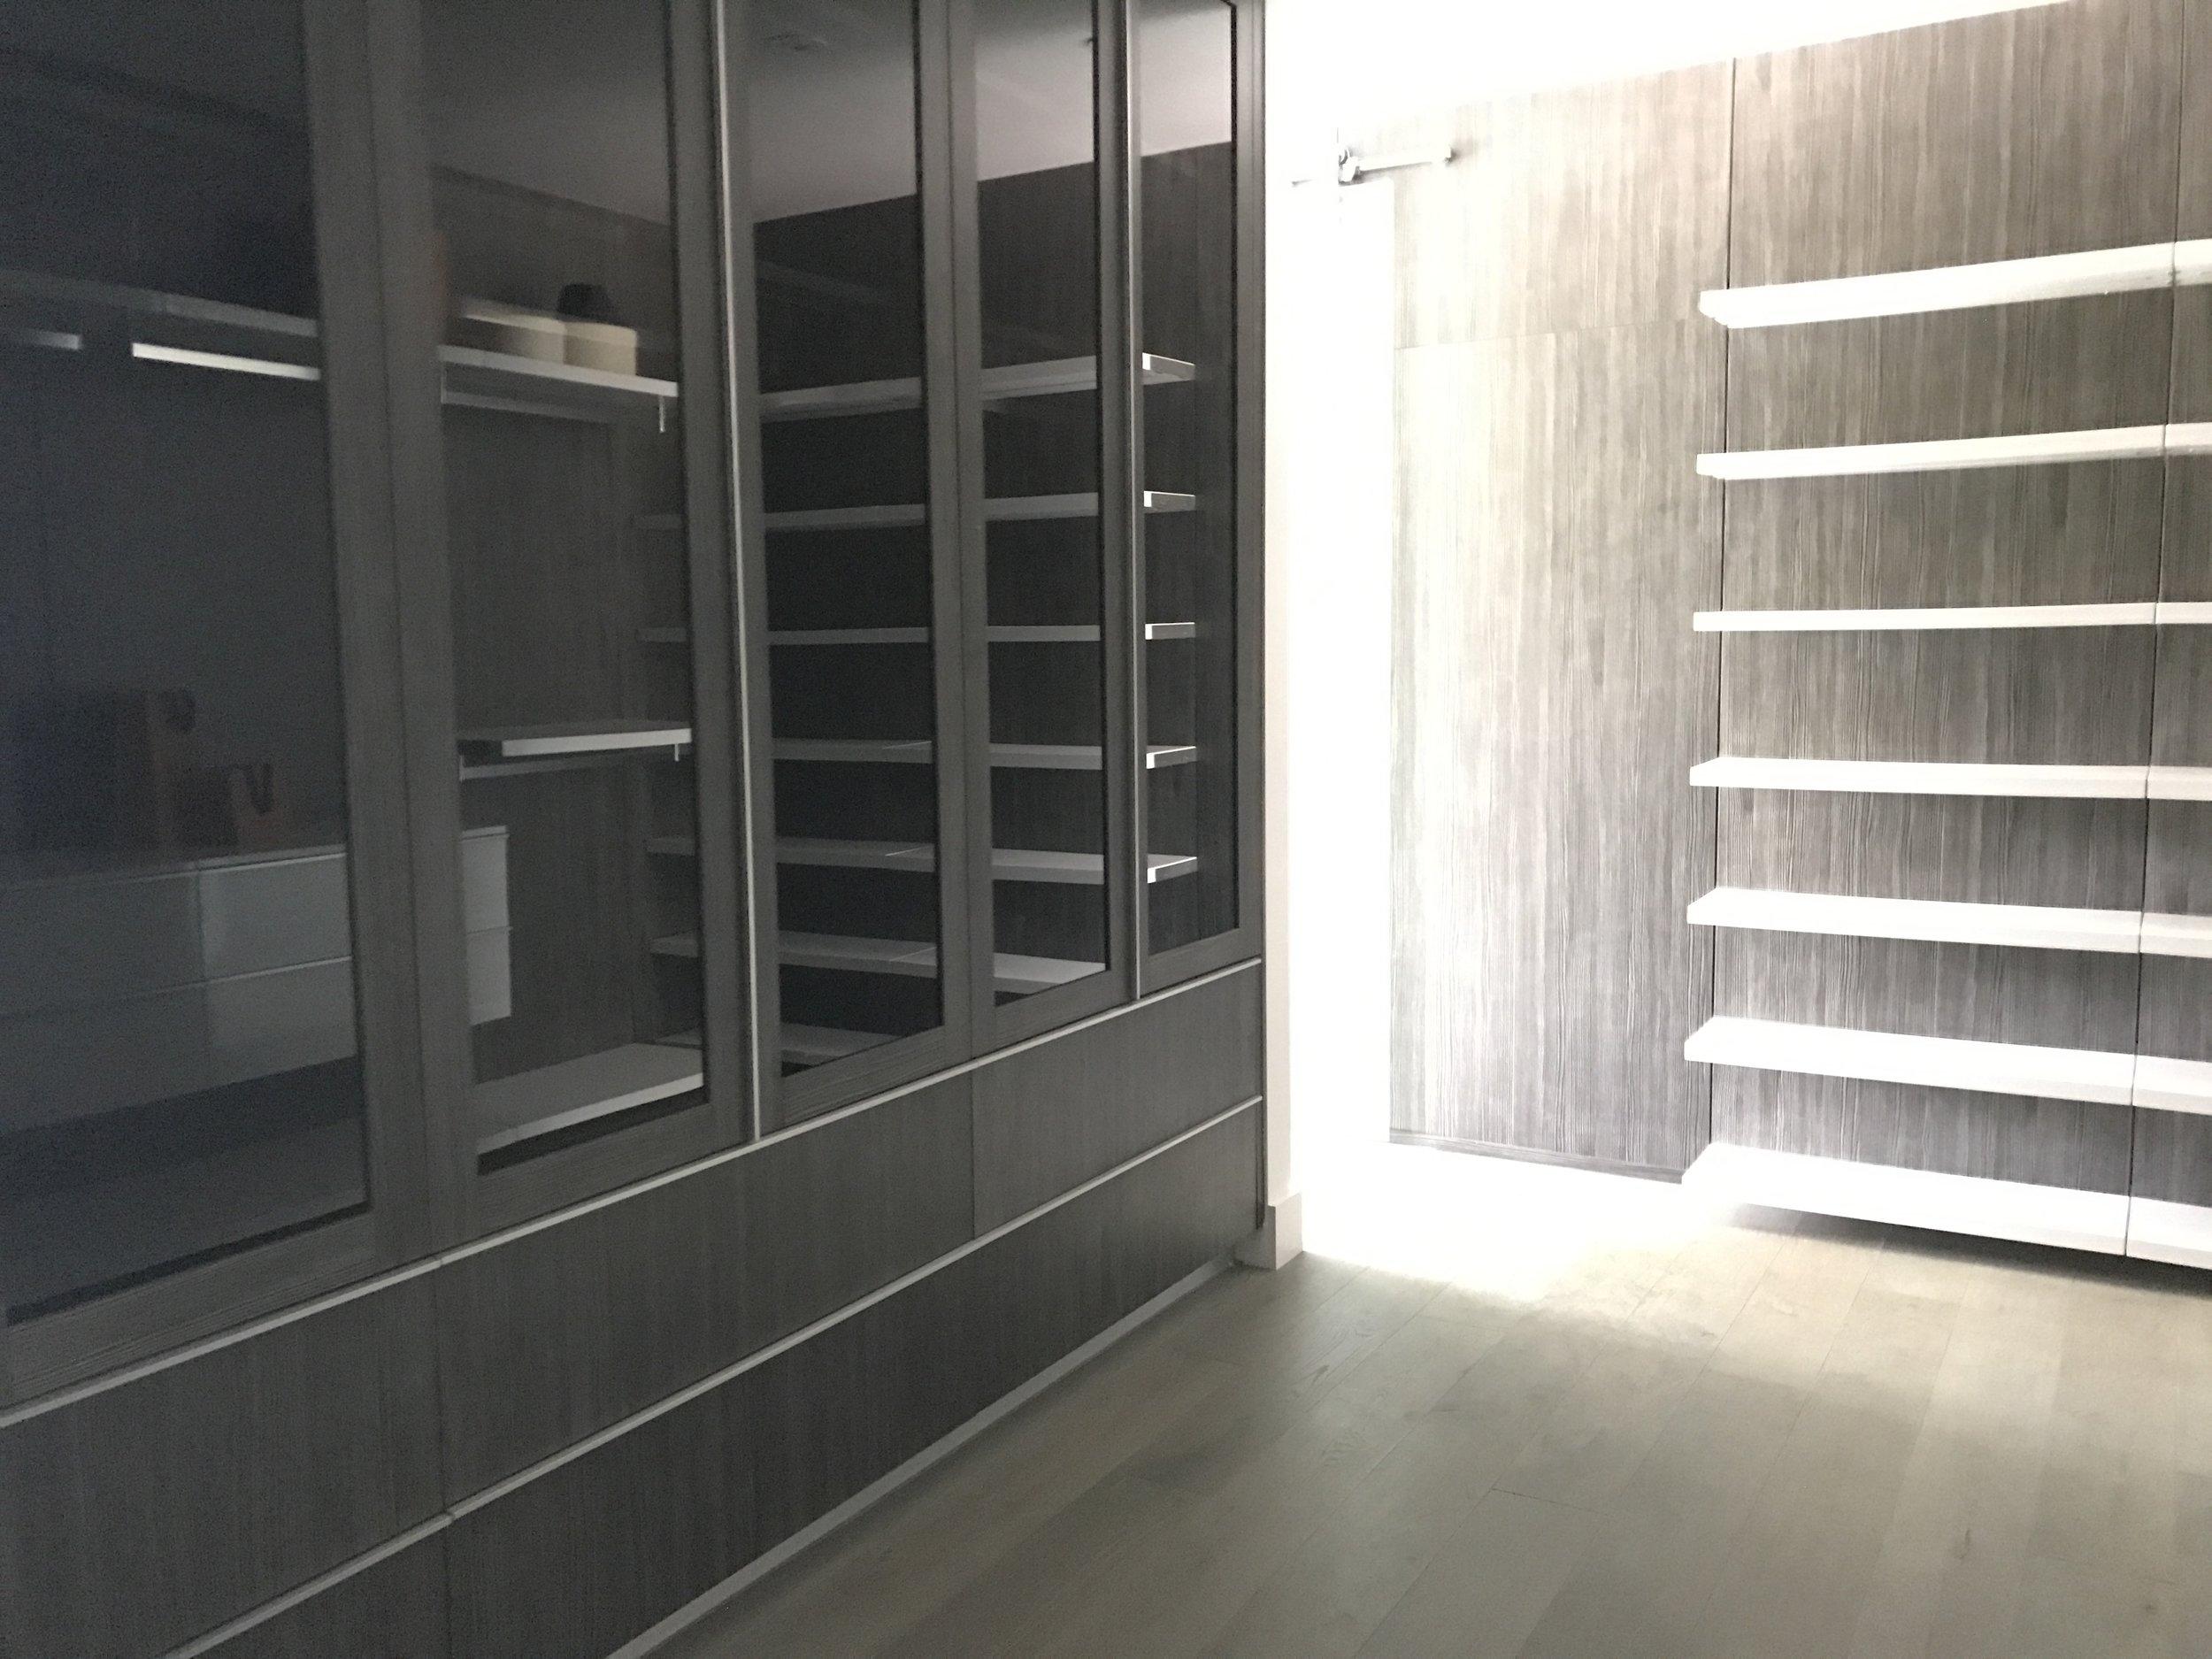 35 - Walk-in Closet3.JPG